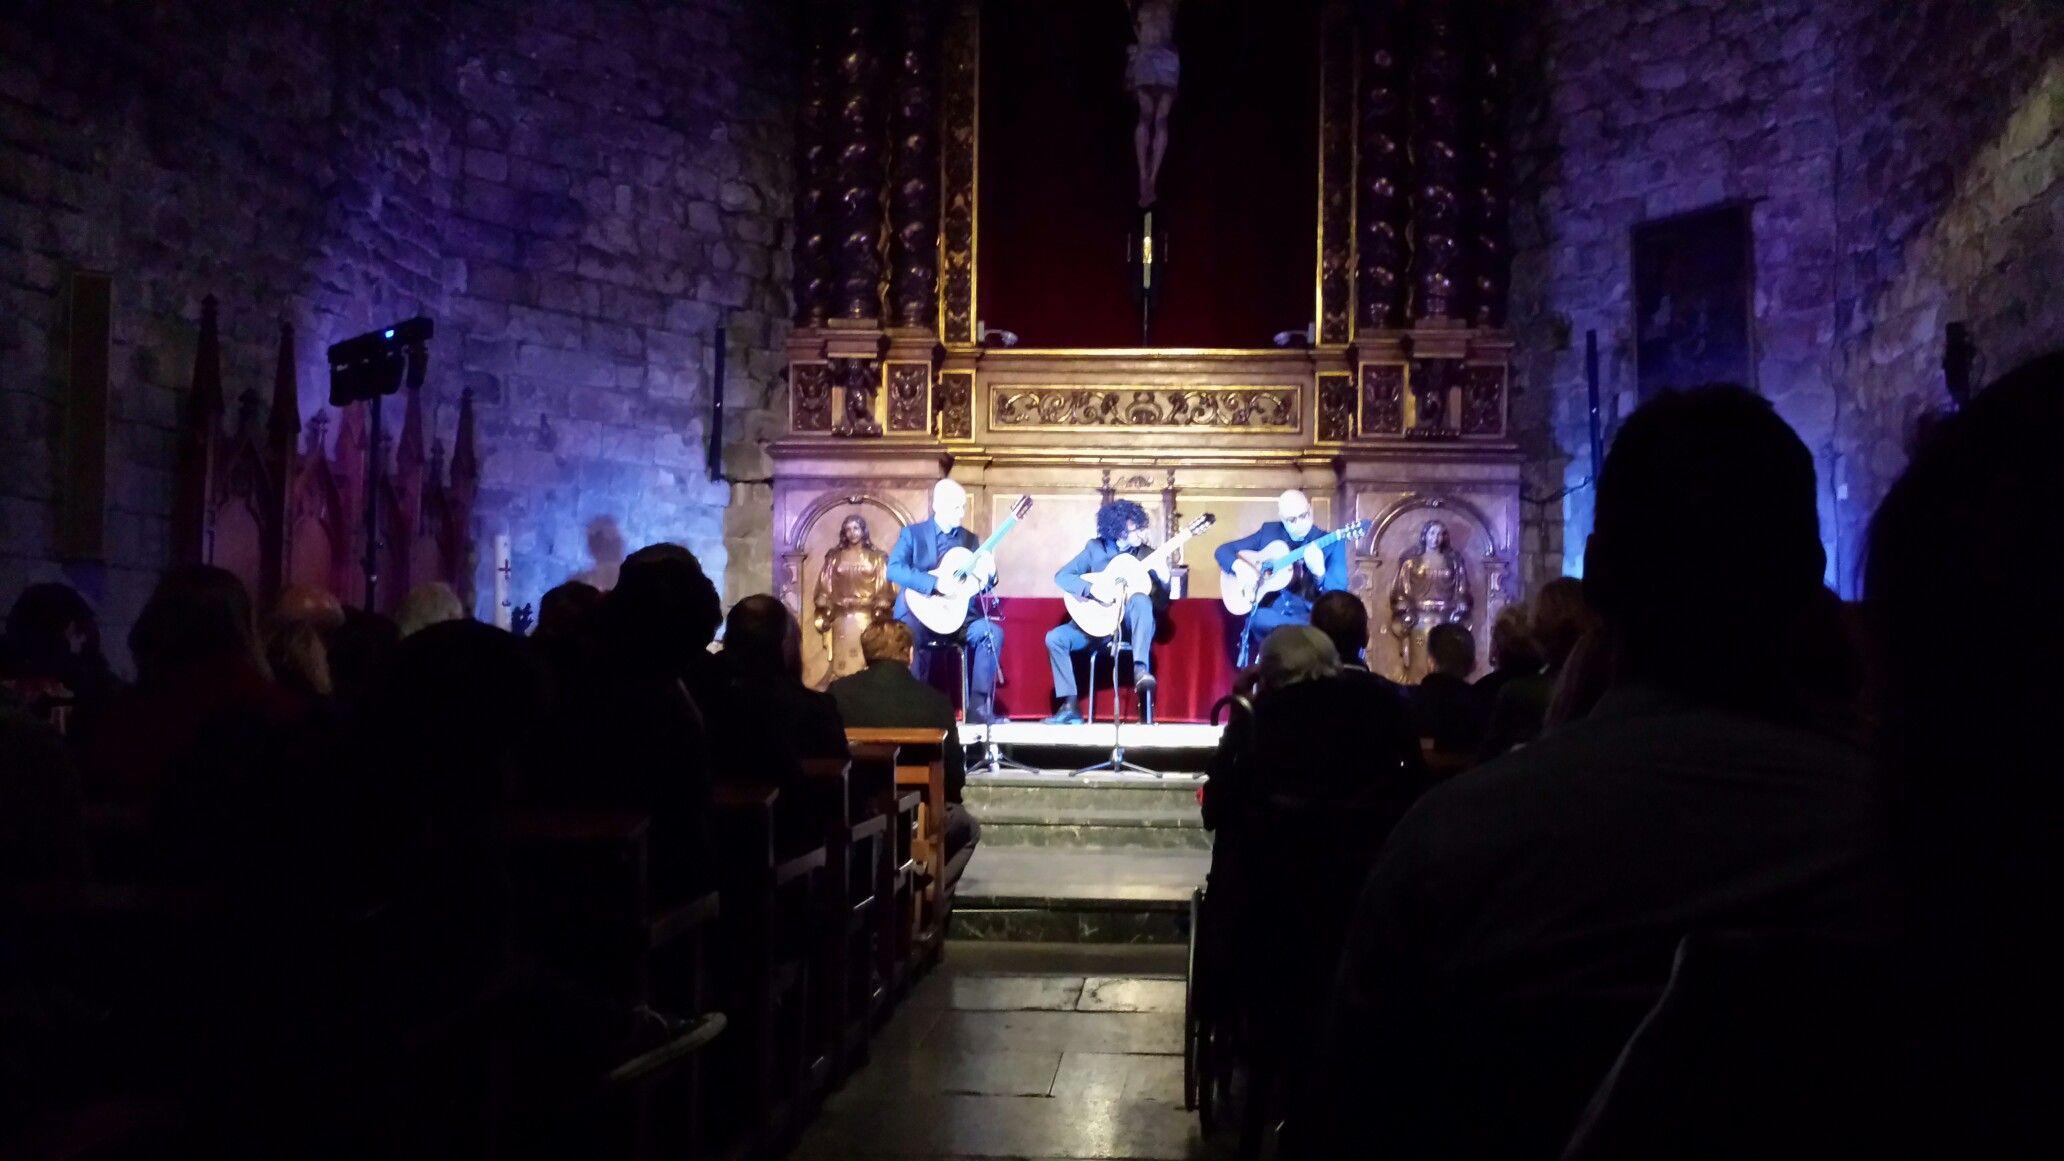 Concierto de guitarras flamencas. Basìlica de Santa Maria del Pi. Barcelona.